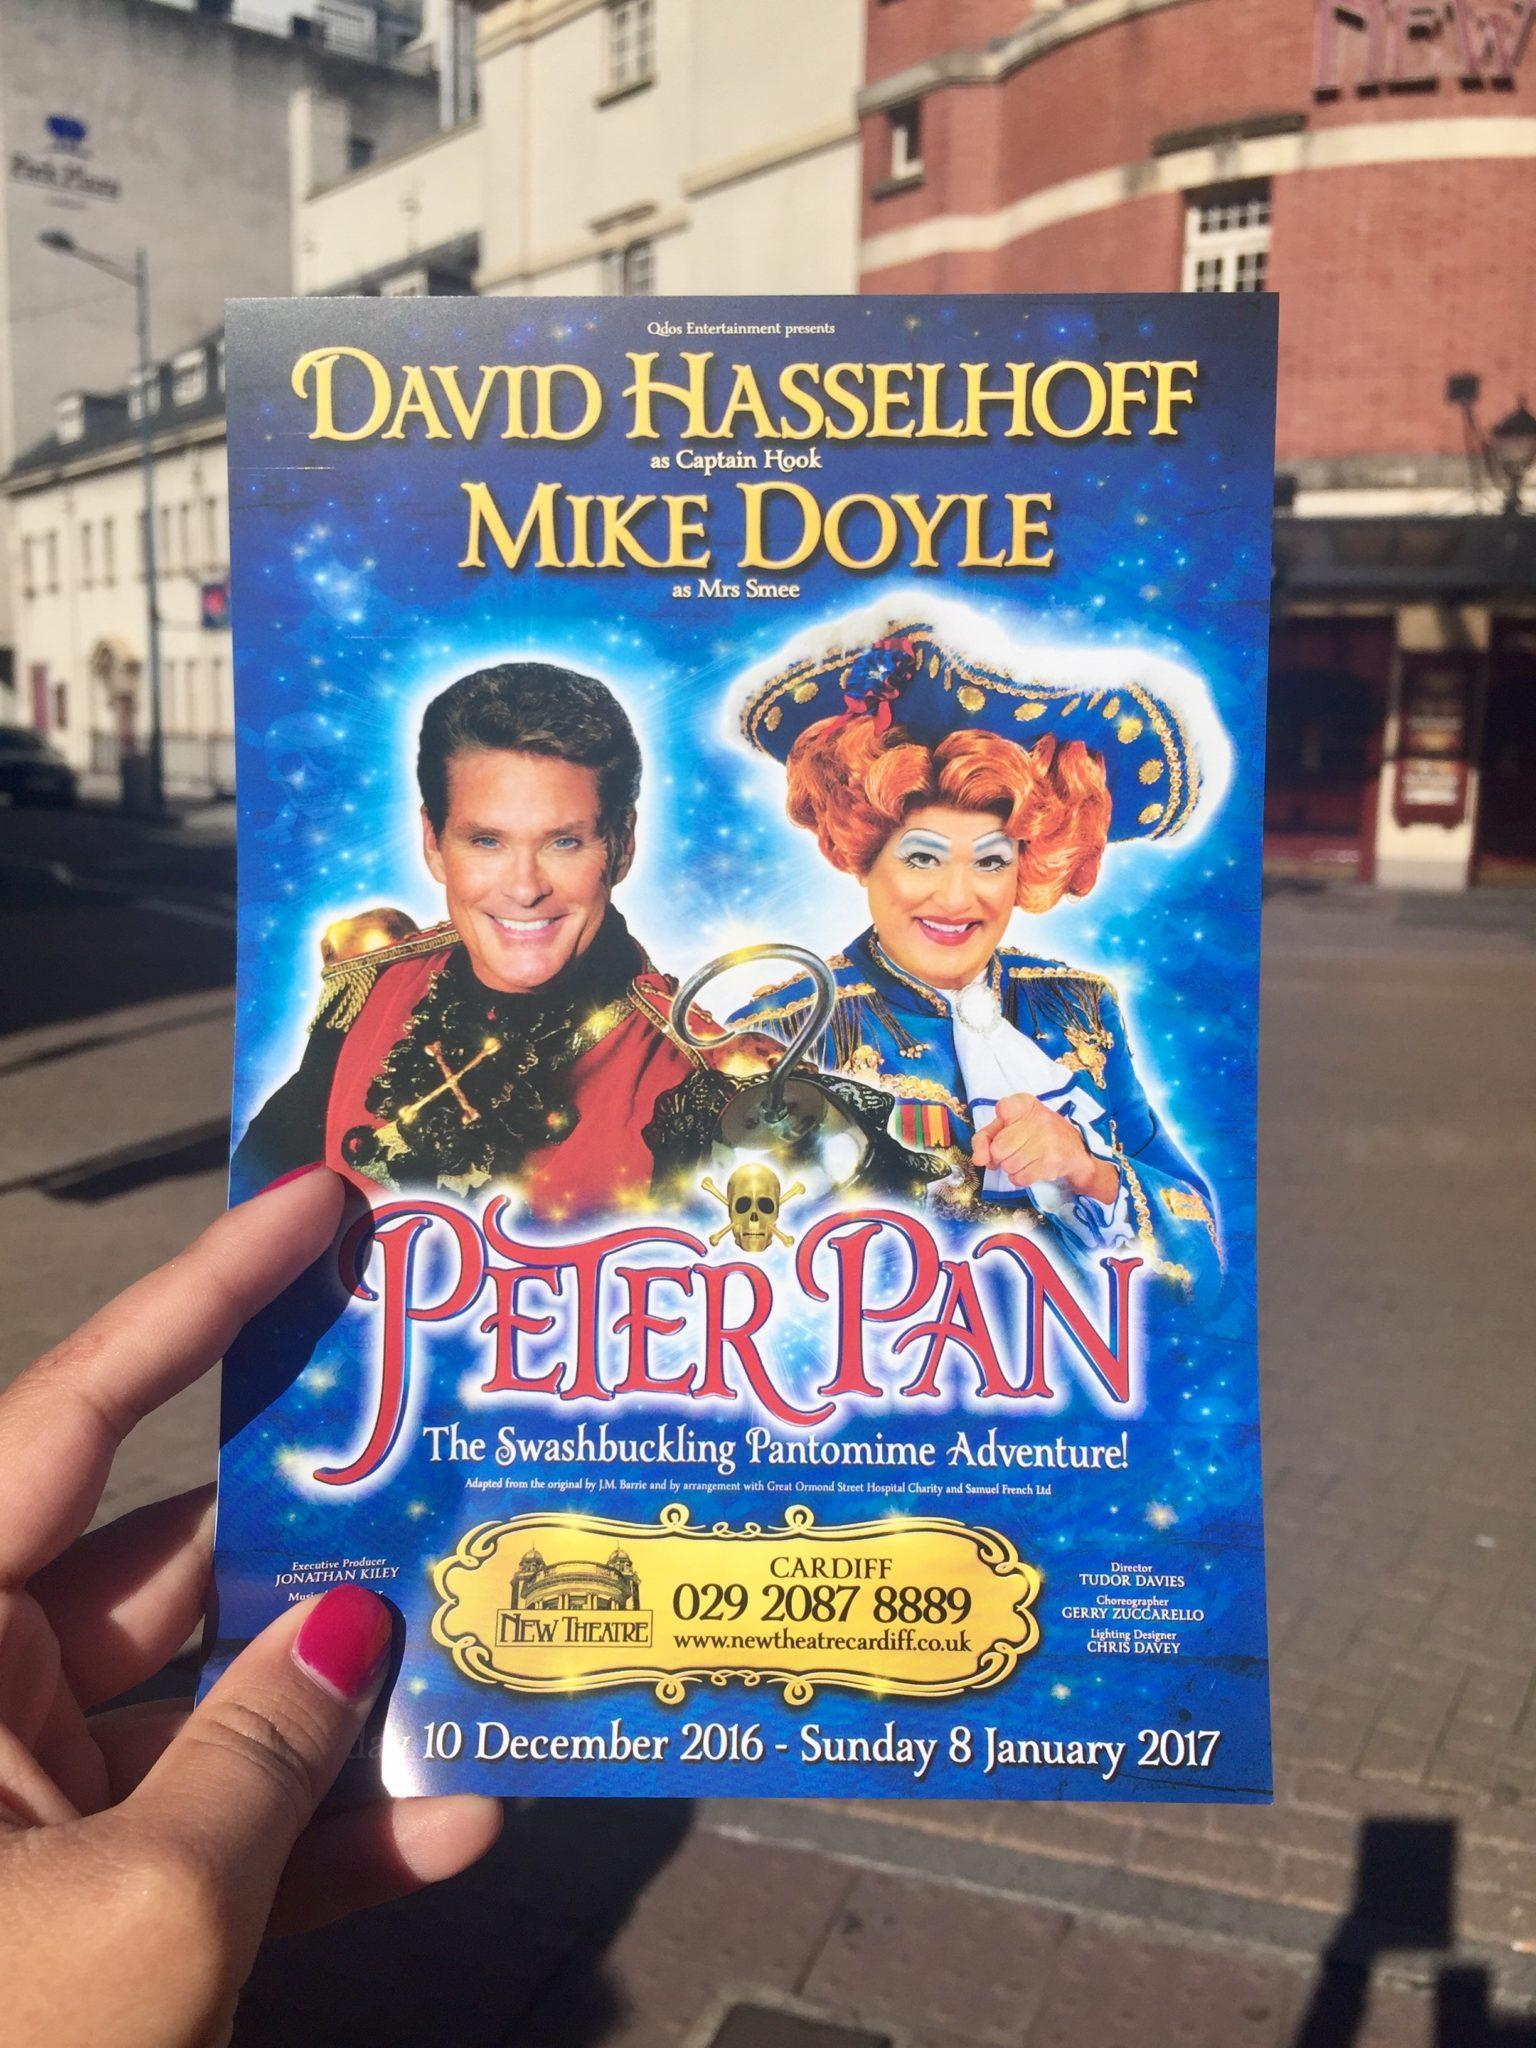 David Hasselhoff in Cardiff